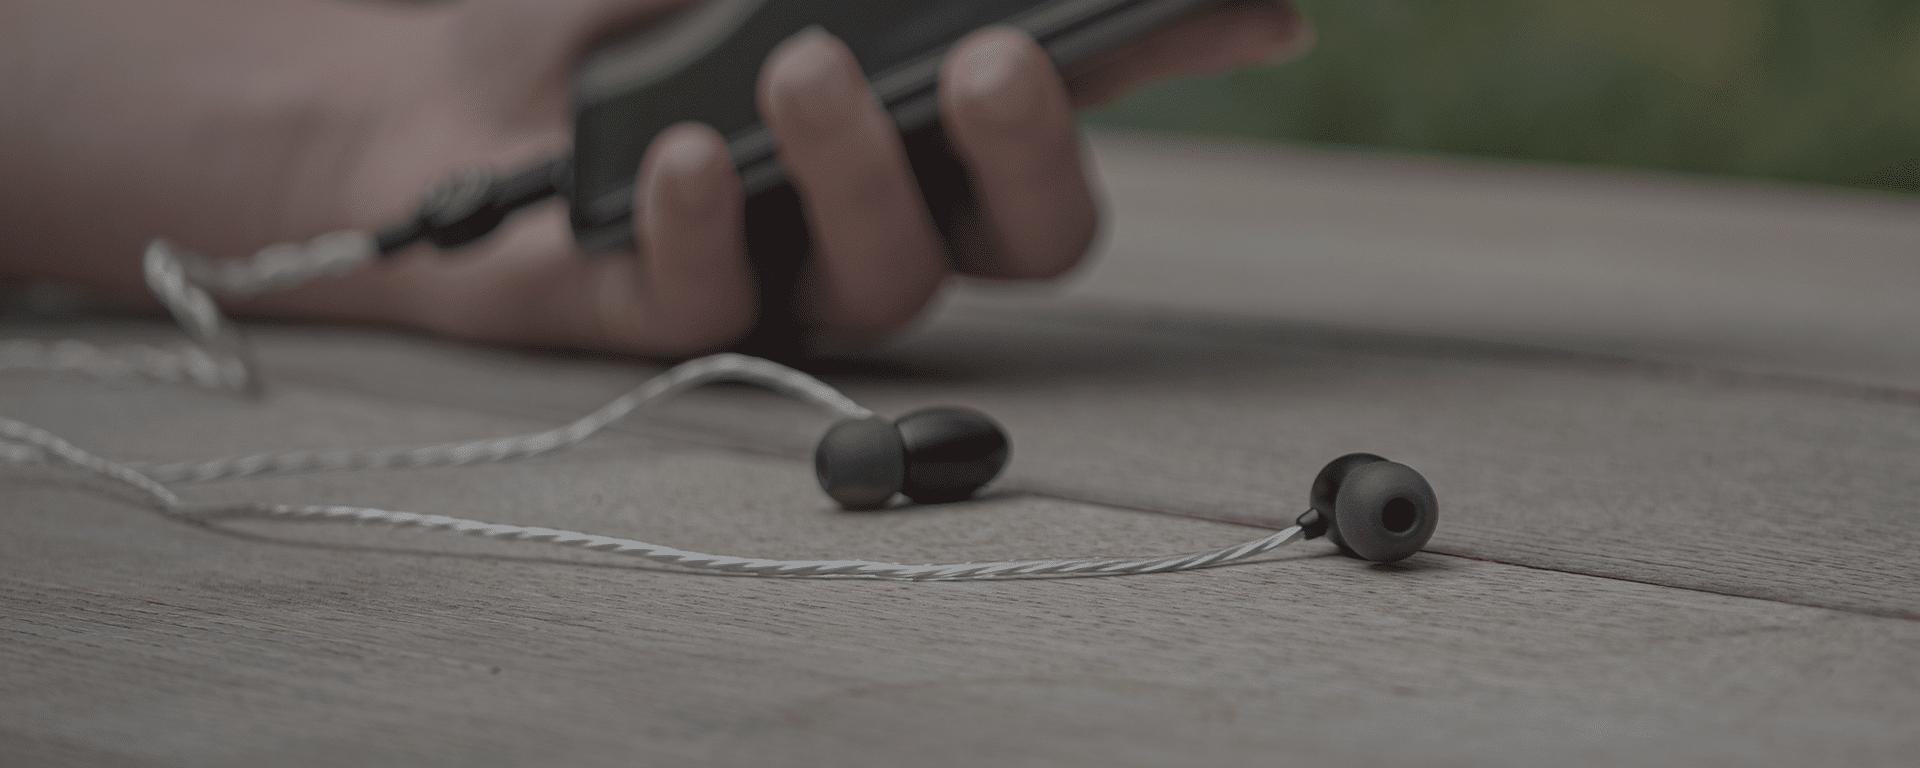 Megaclite 4.0 USound MEMS speakers based